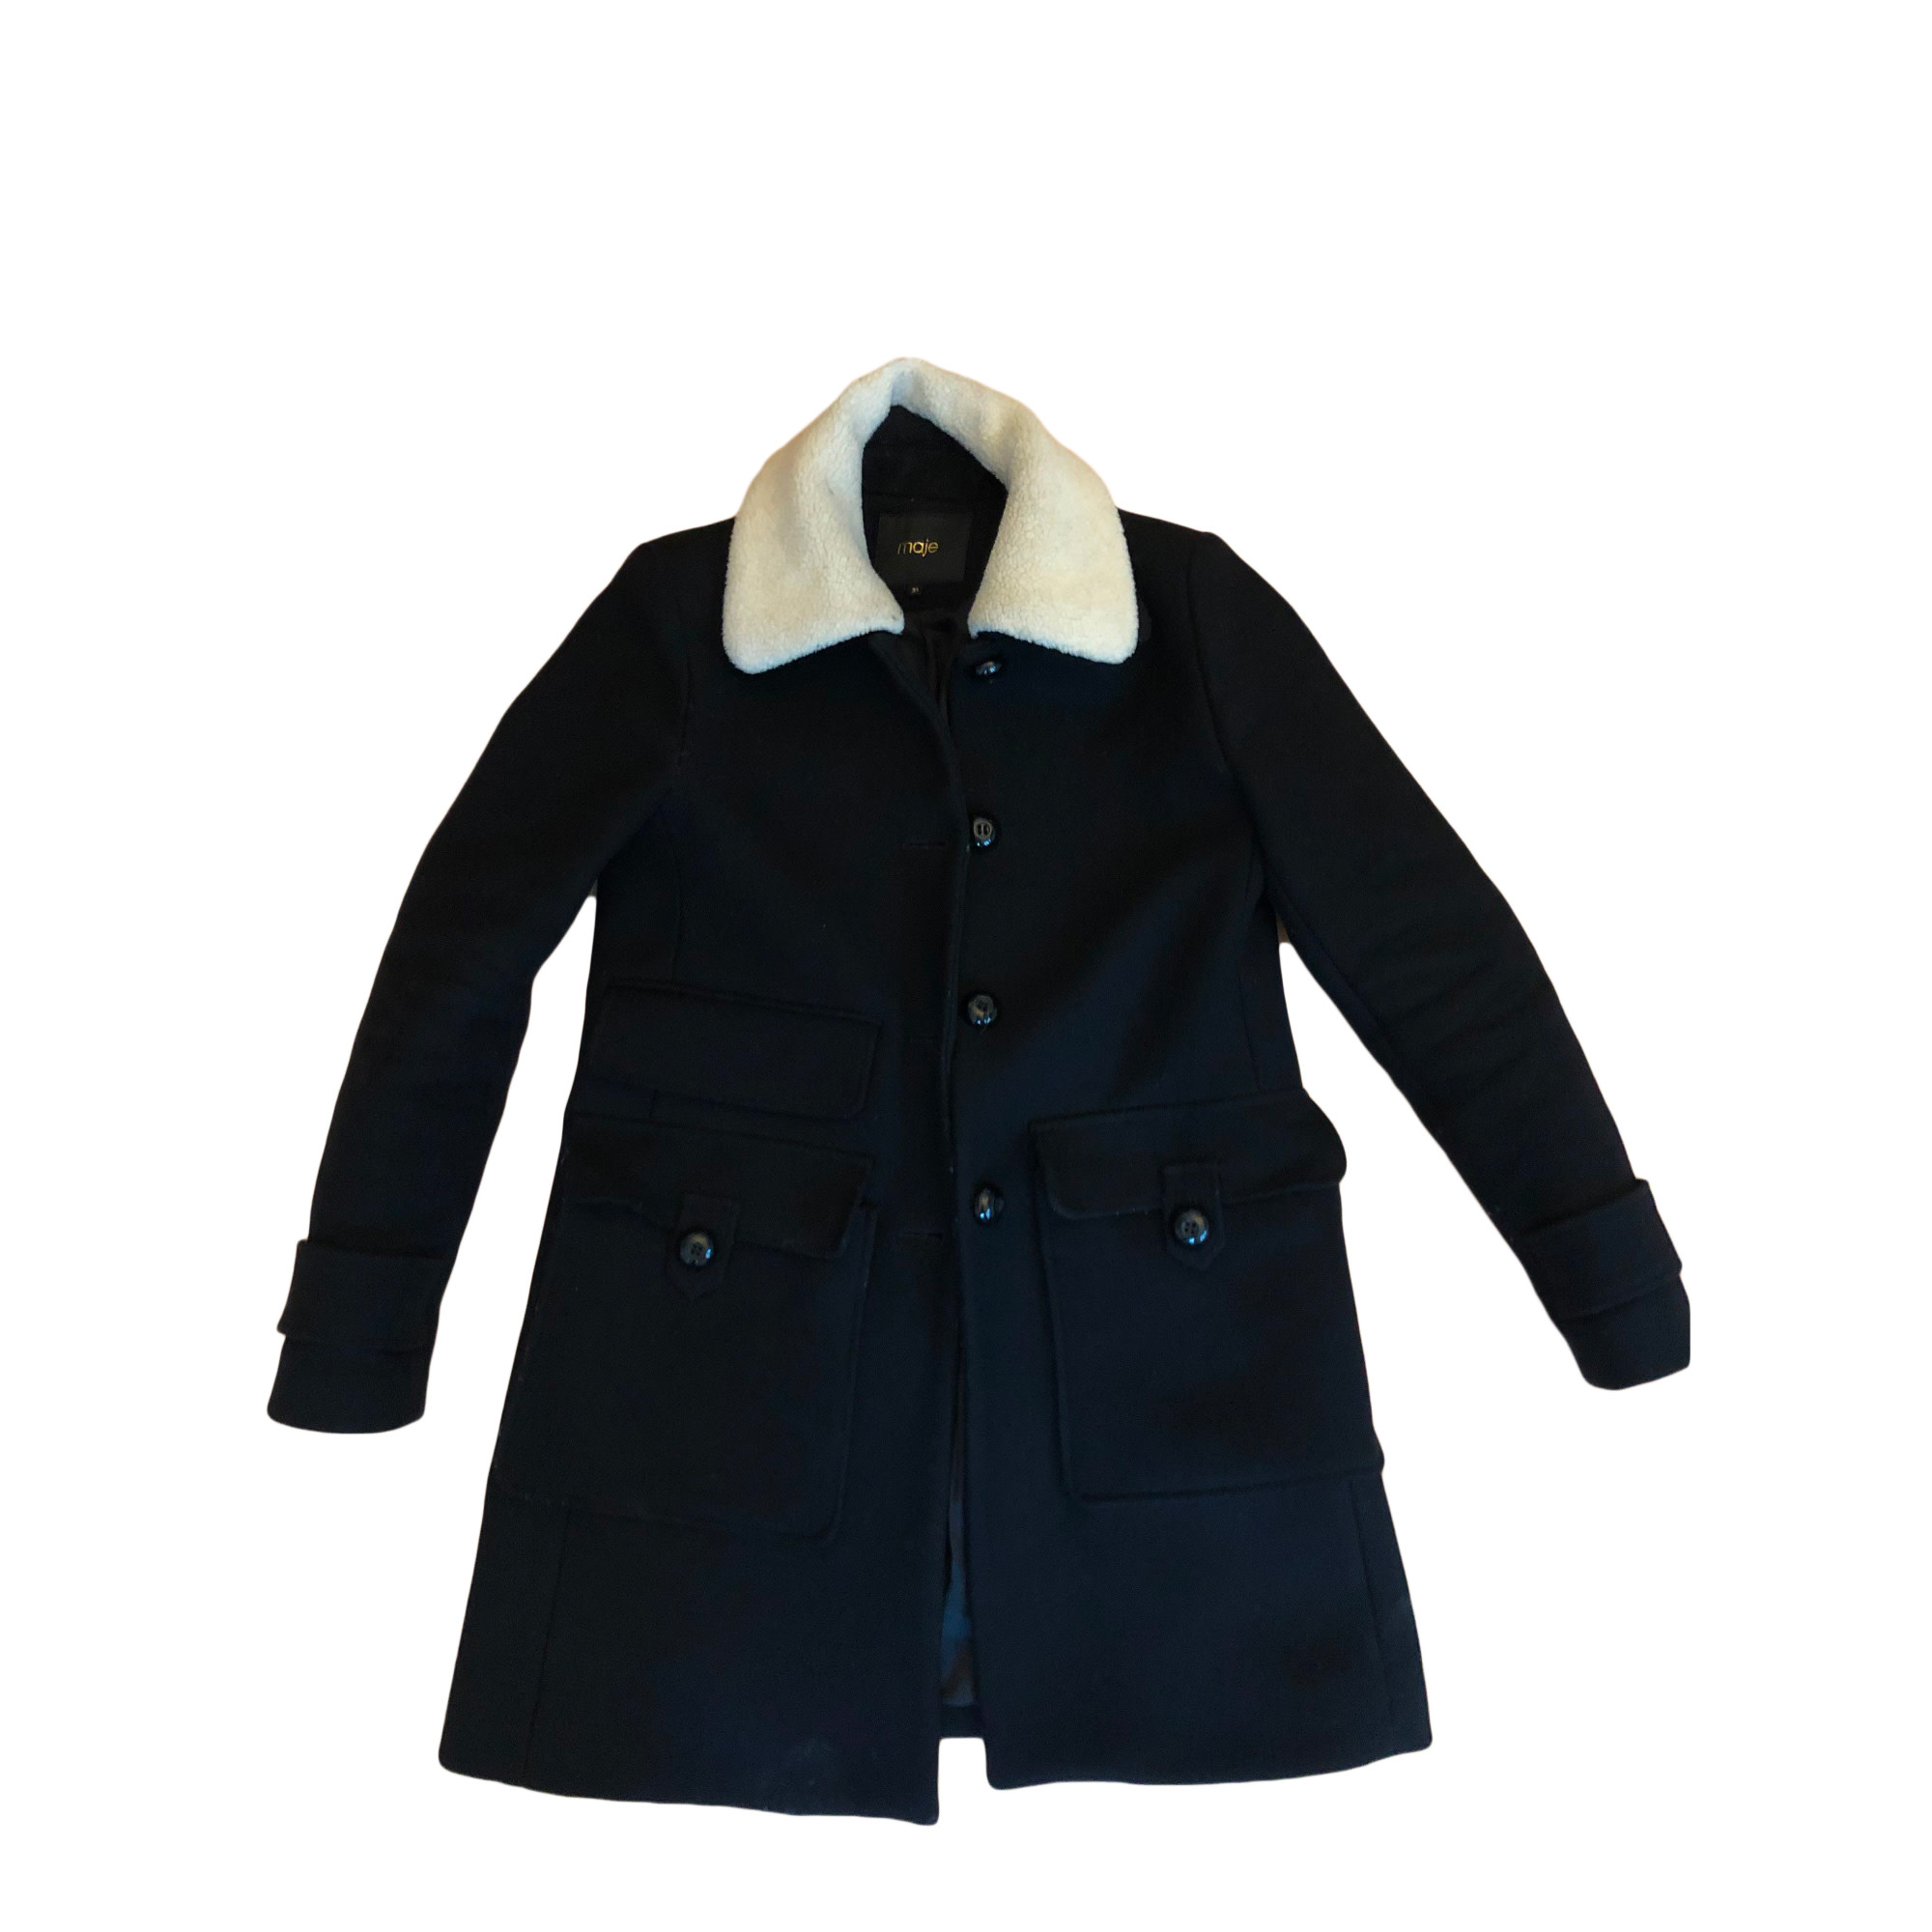 manteau maje col mouton gros boutons